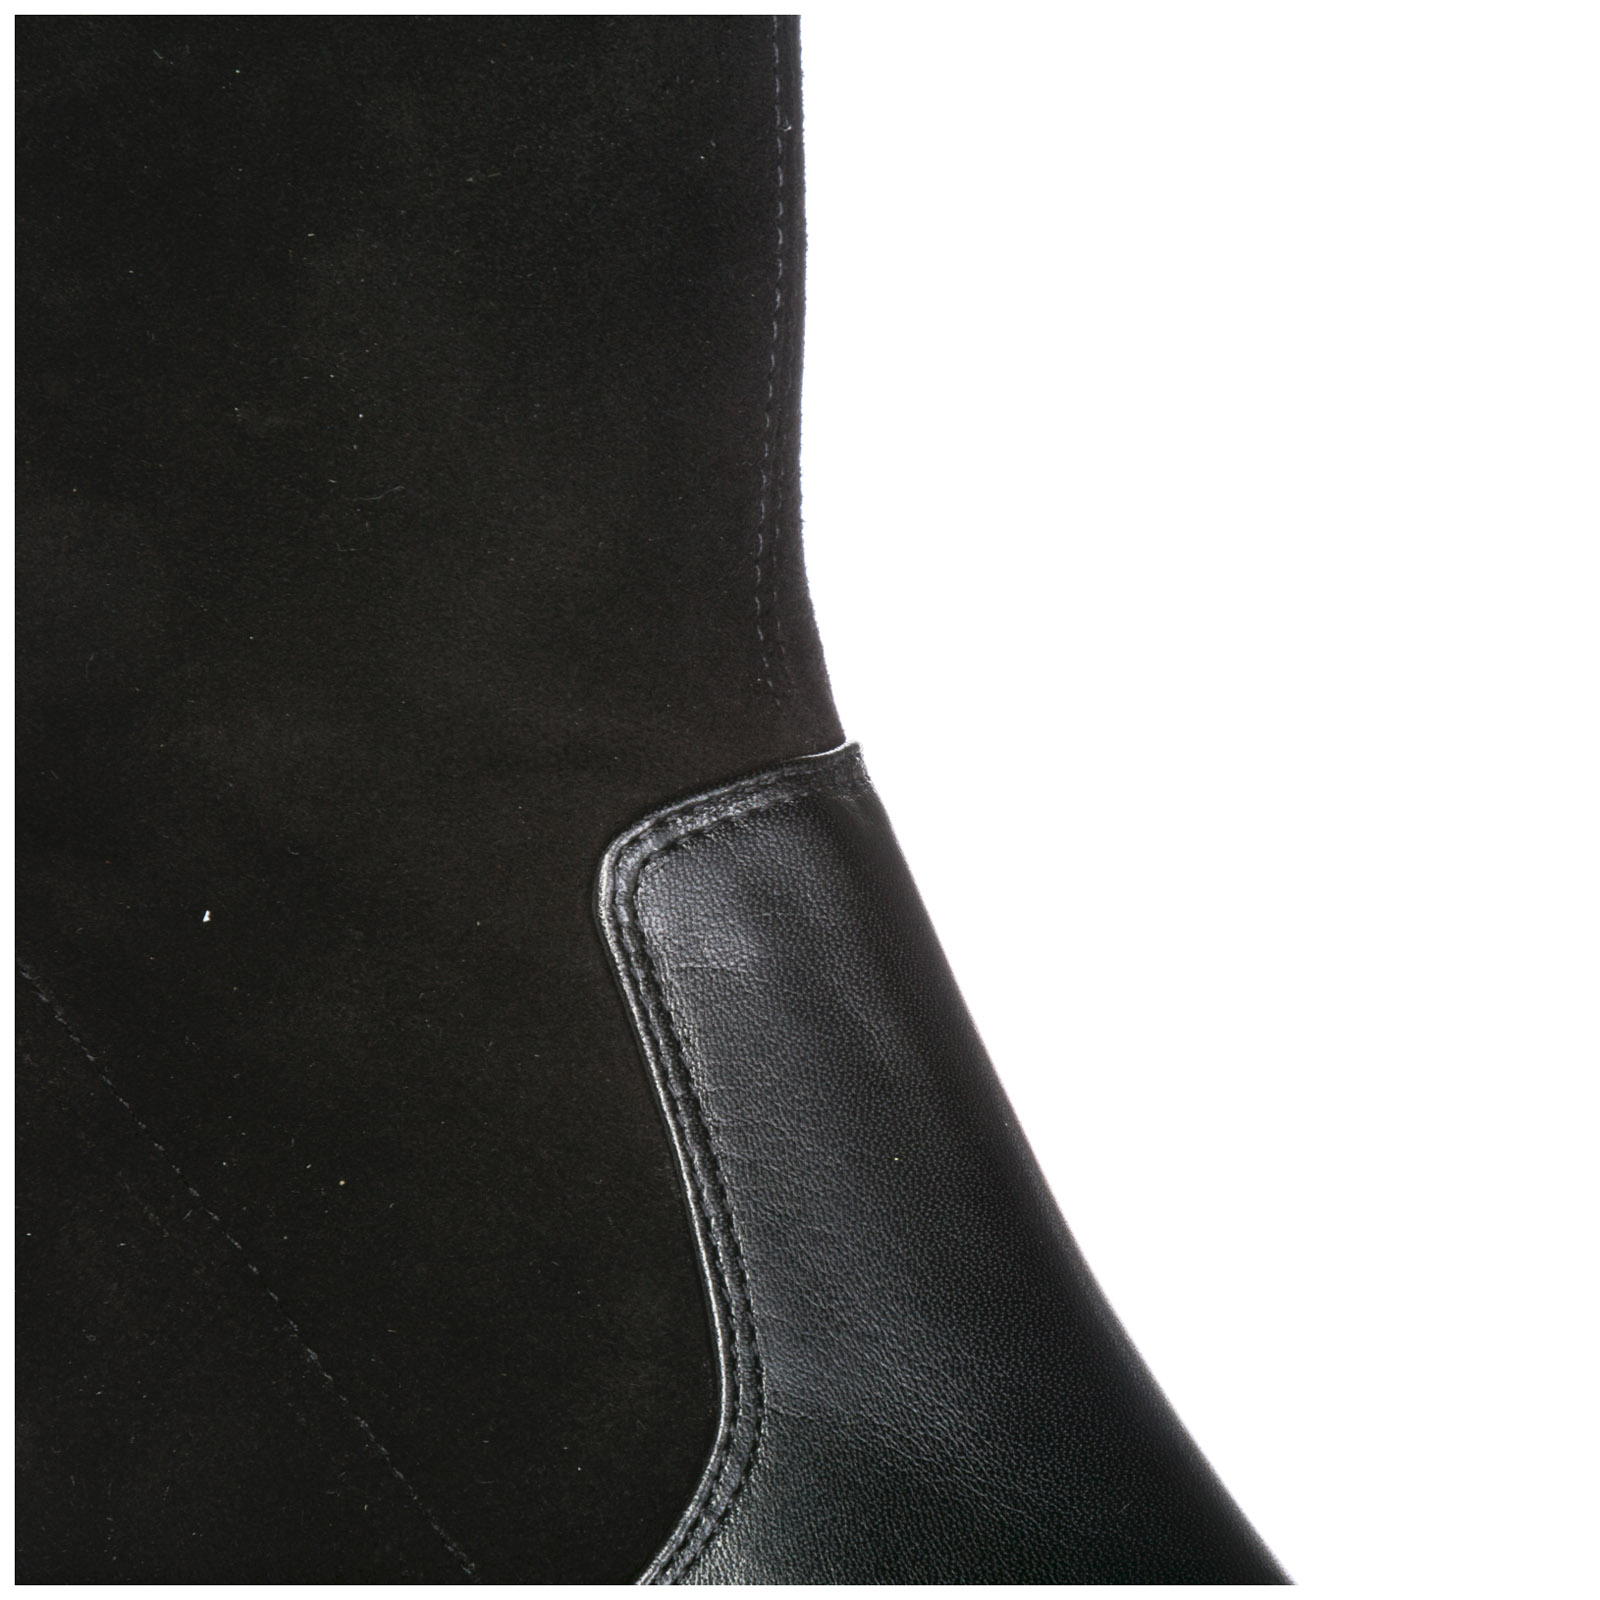 85a4b0c94a8b Knee high boots Tory Burch Georgina 50693 perfect black